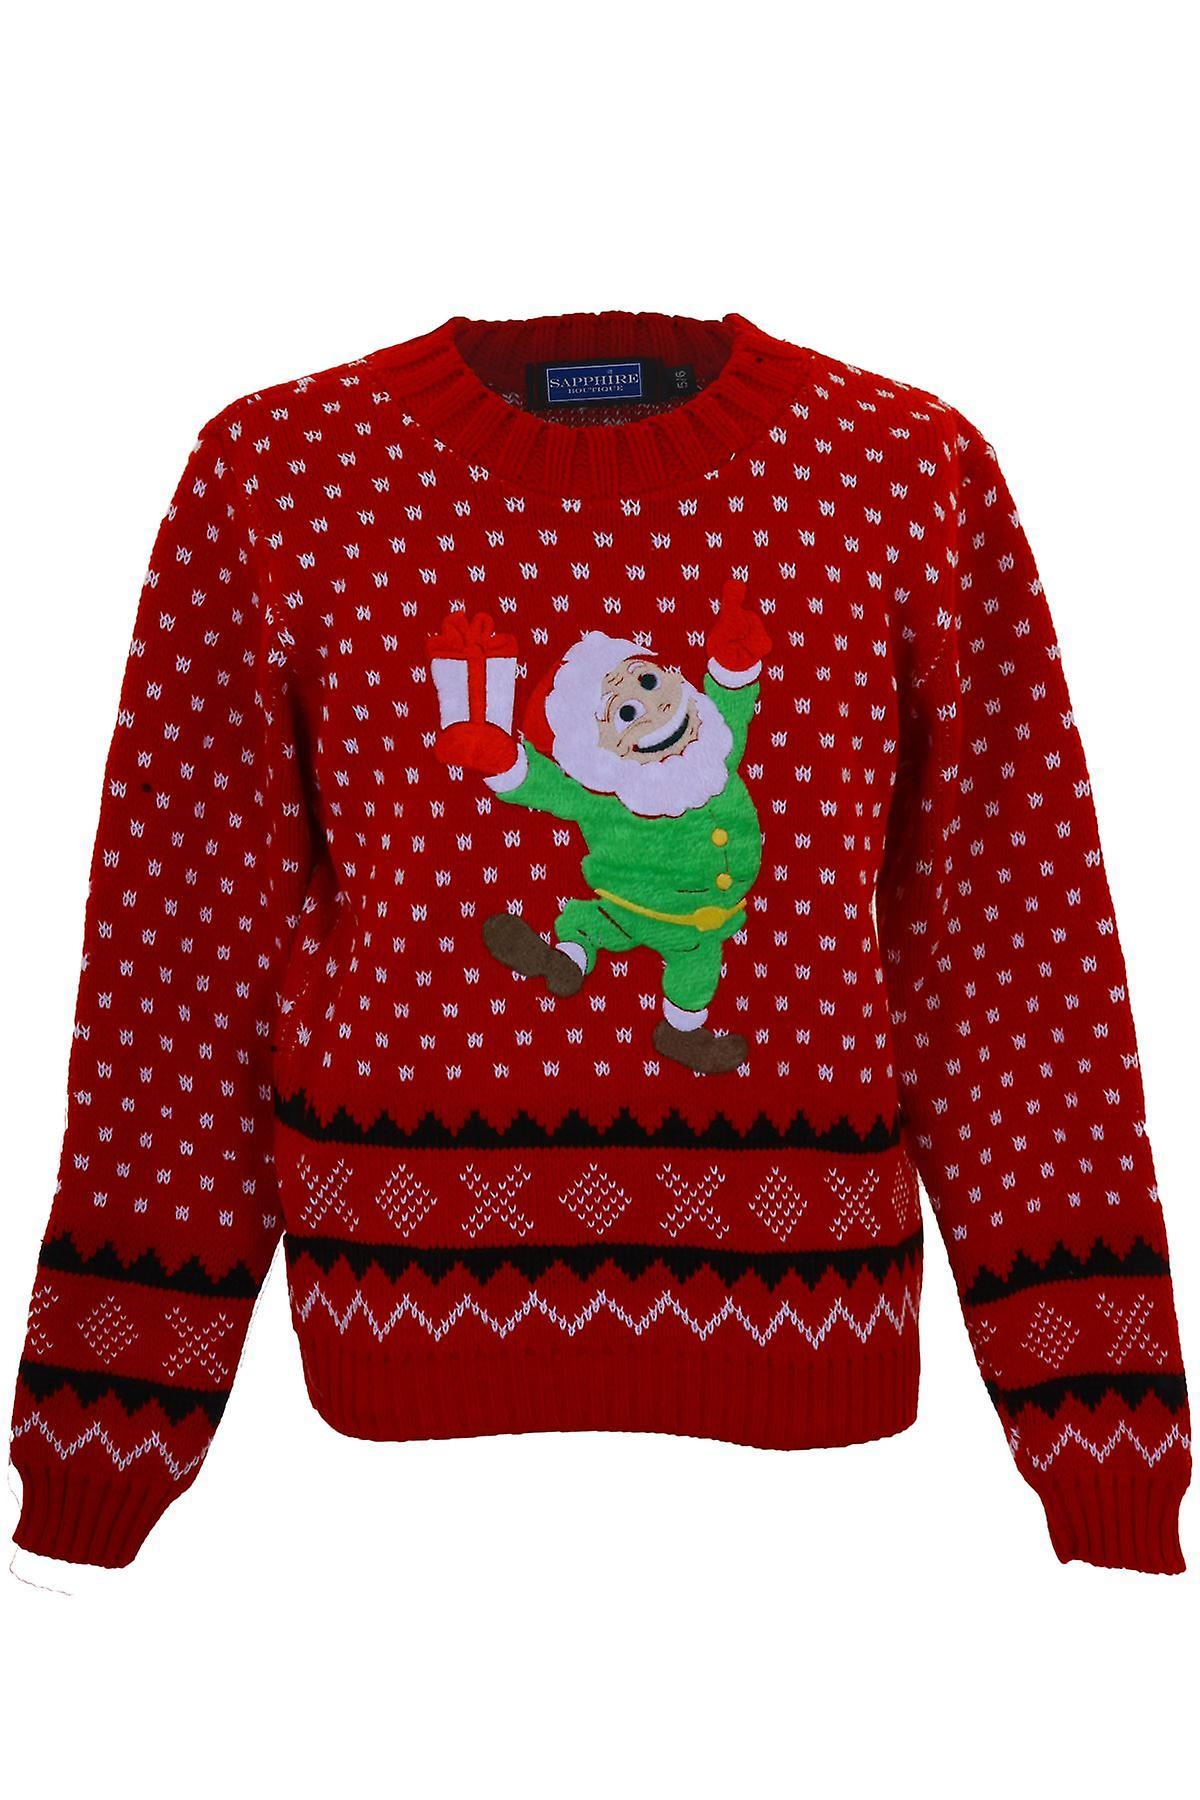 Children's Knitted XMAS Christmas Festive Santa Snow Girls Aztec Sweater Jumper